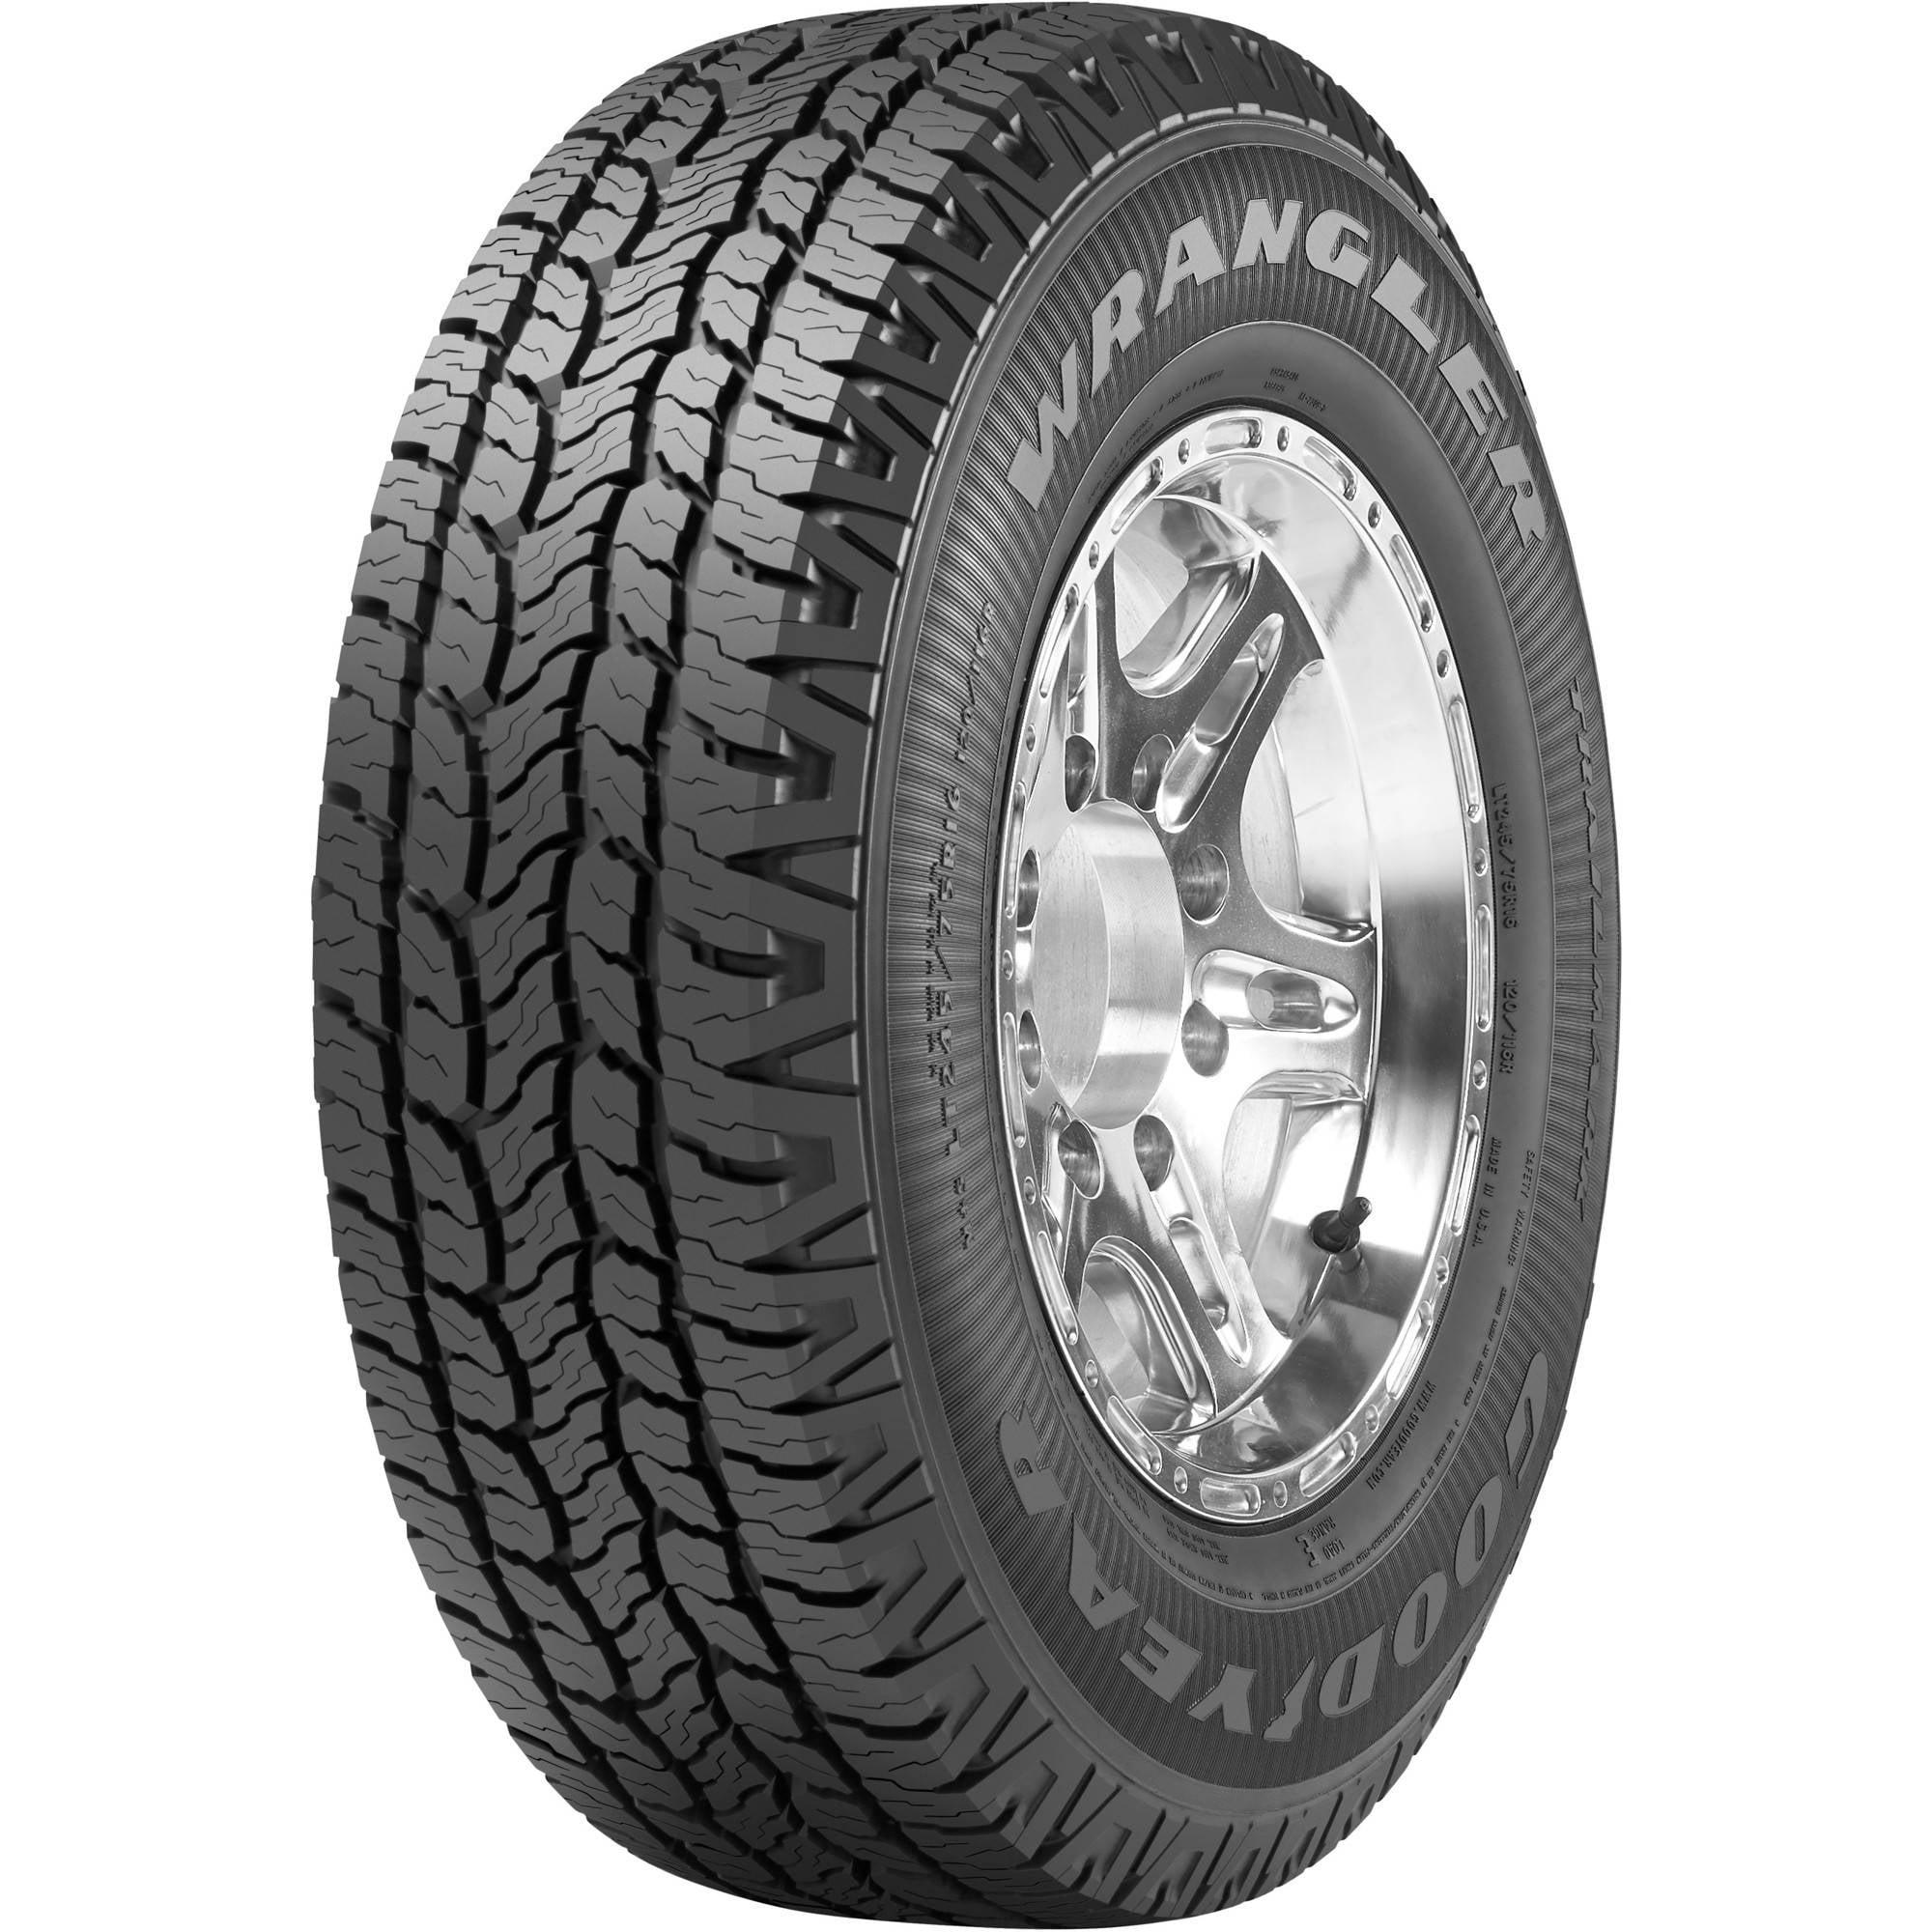 Goodyear Wrangler Trailmark Tire P245 65r17 105t Walmart Com